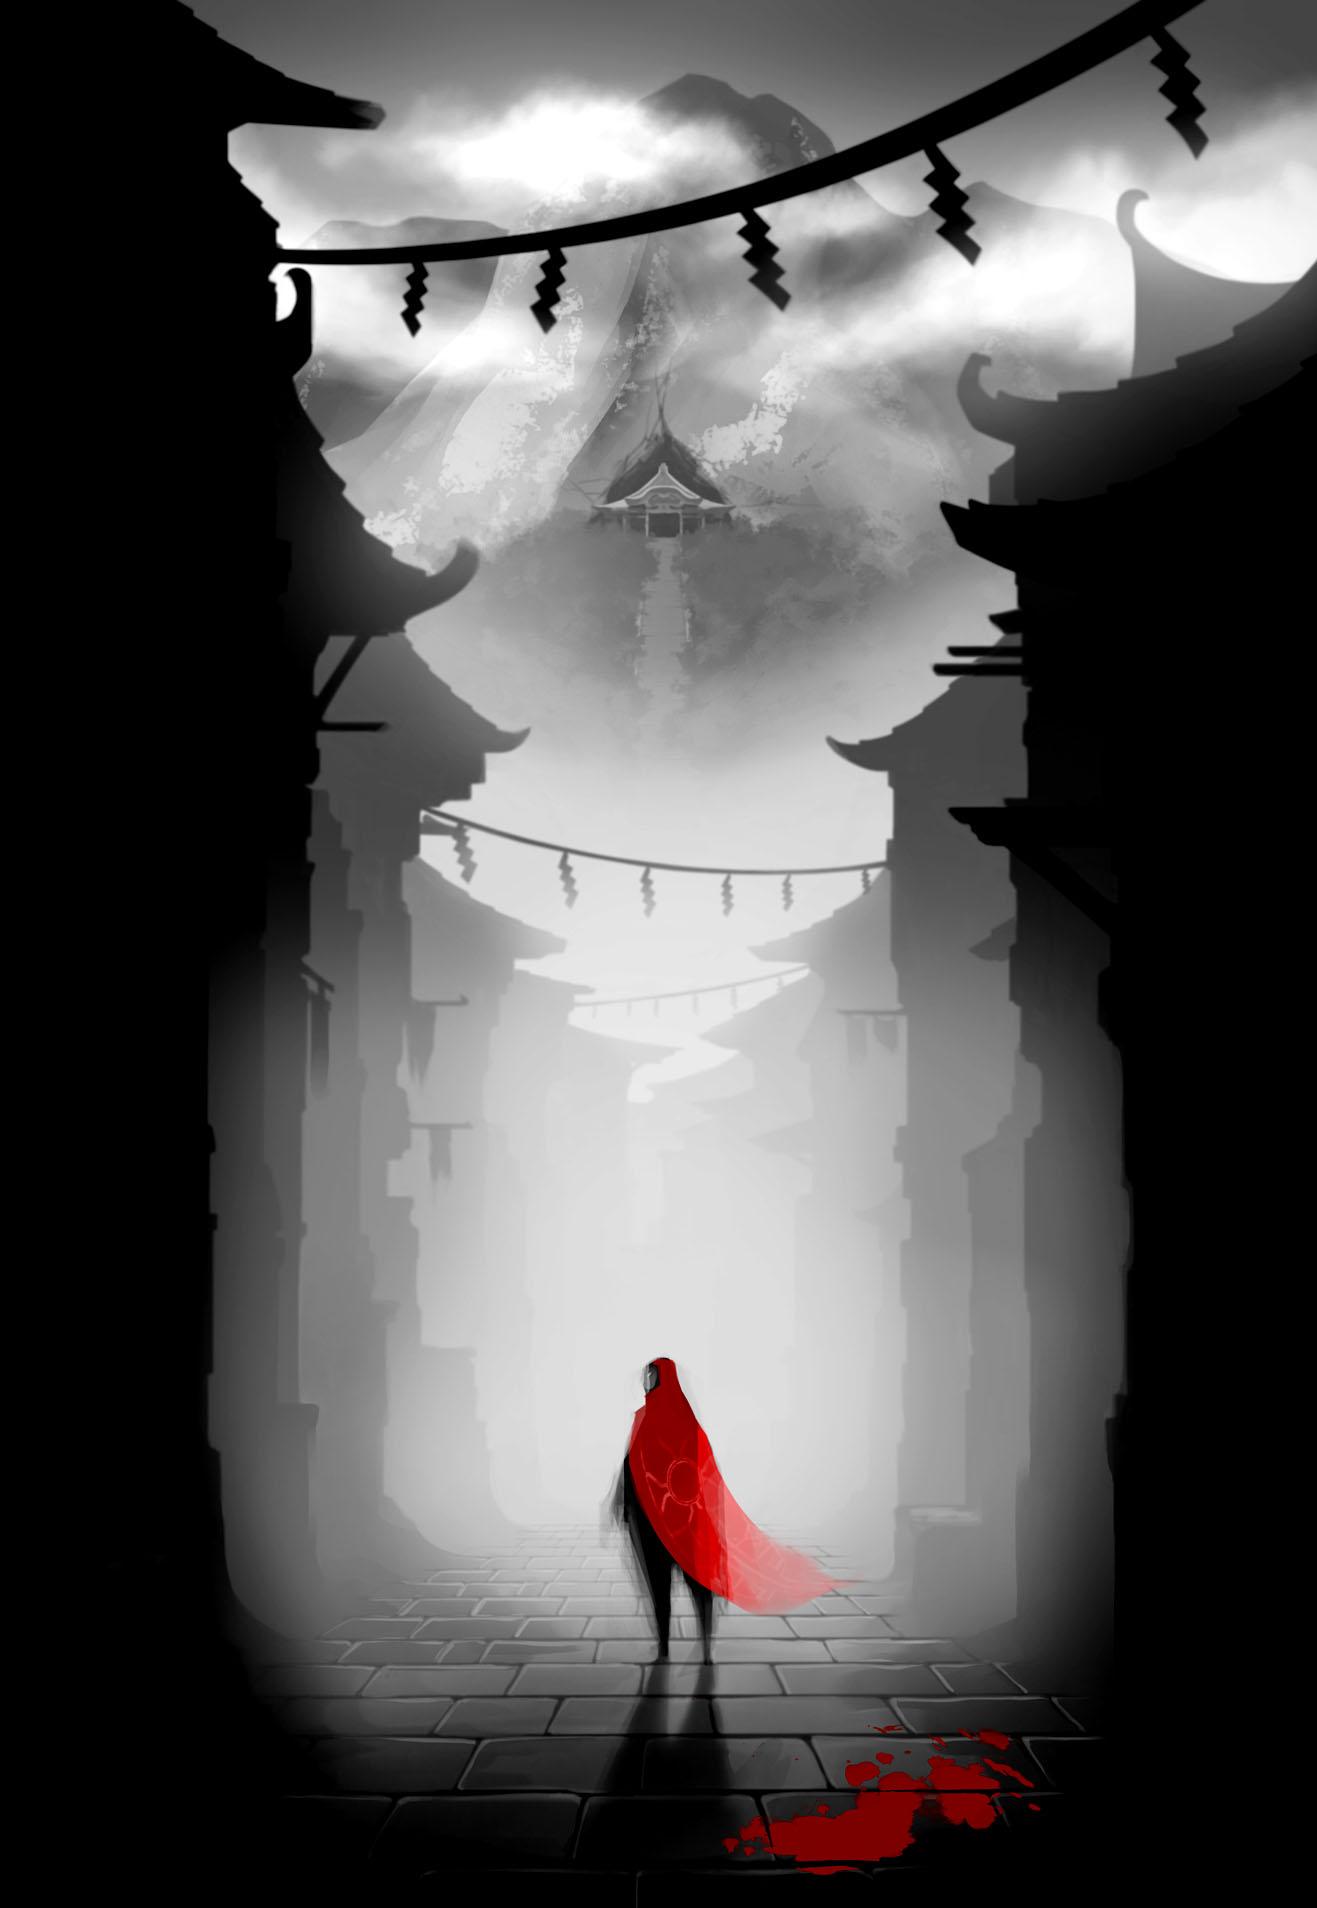 General 1317x1908 Aragami Ninja video games video game art blood mist shadow stairs temple Japanese mountain top